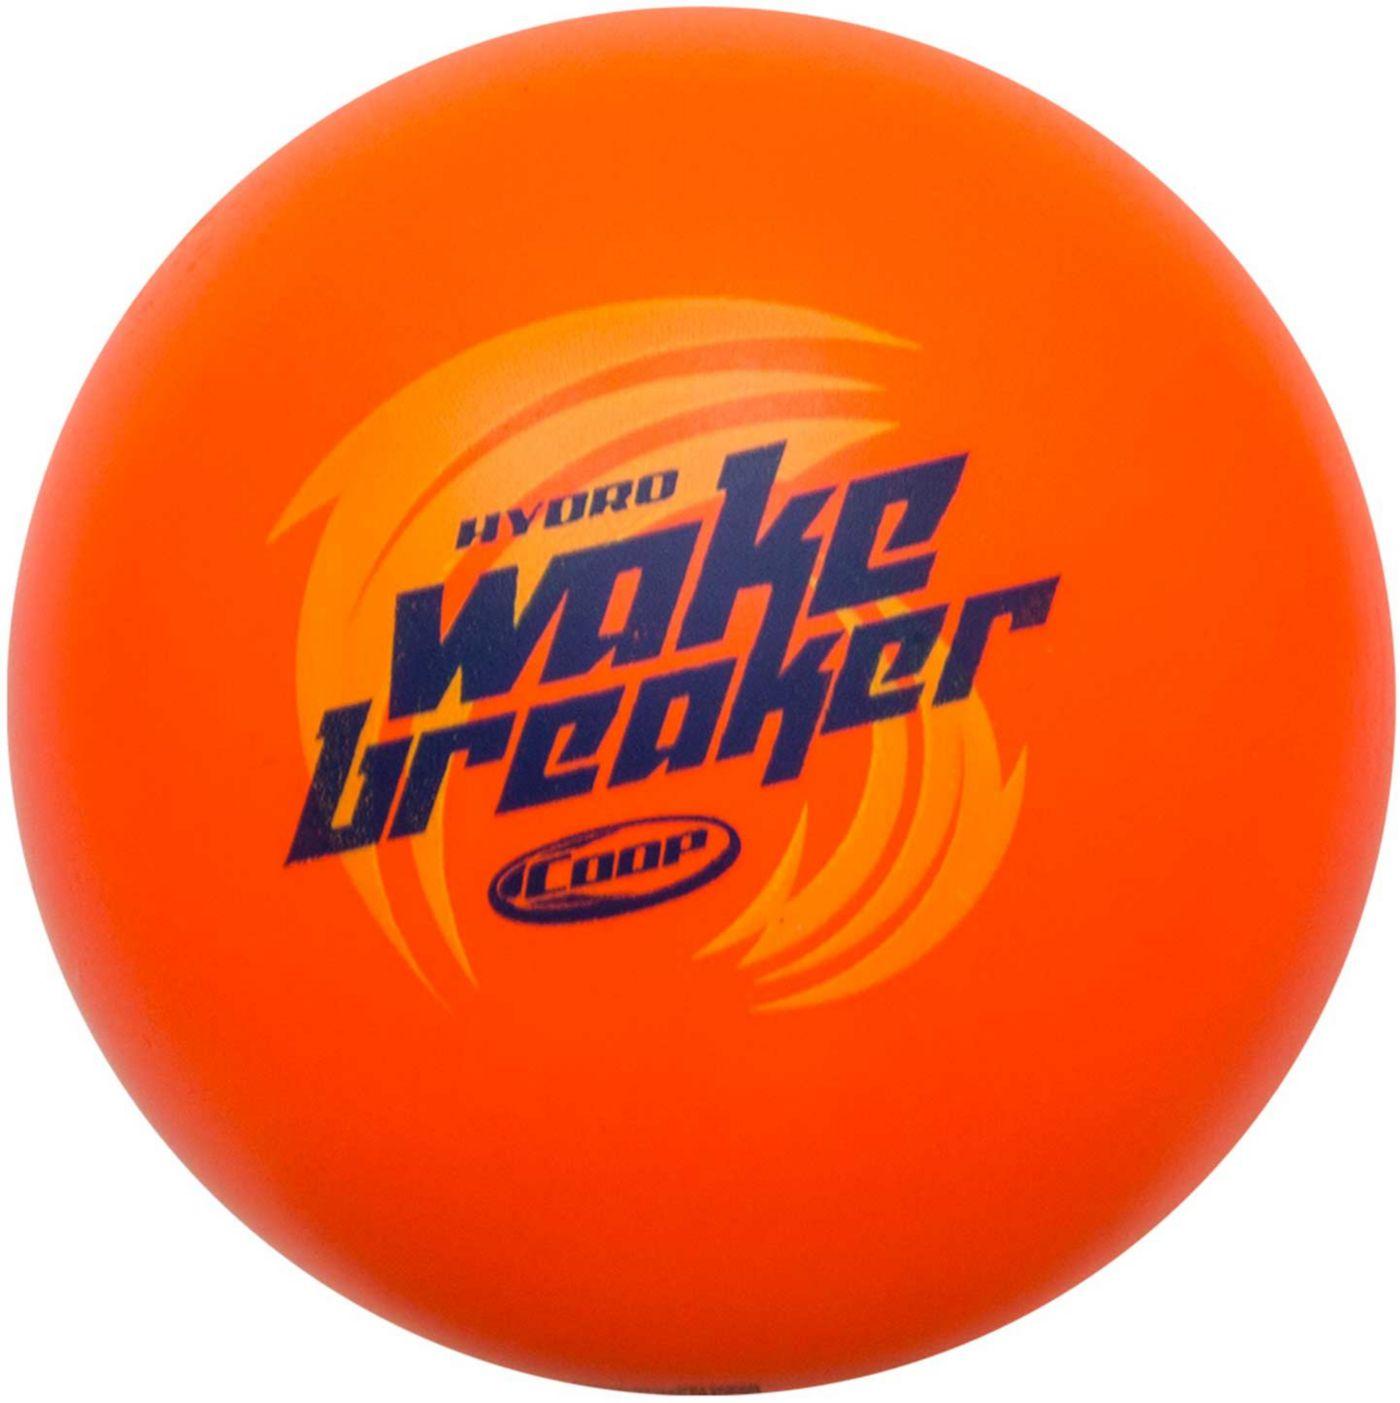 Coop Hydro Wake Breaker Ball